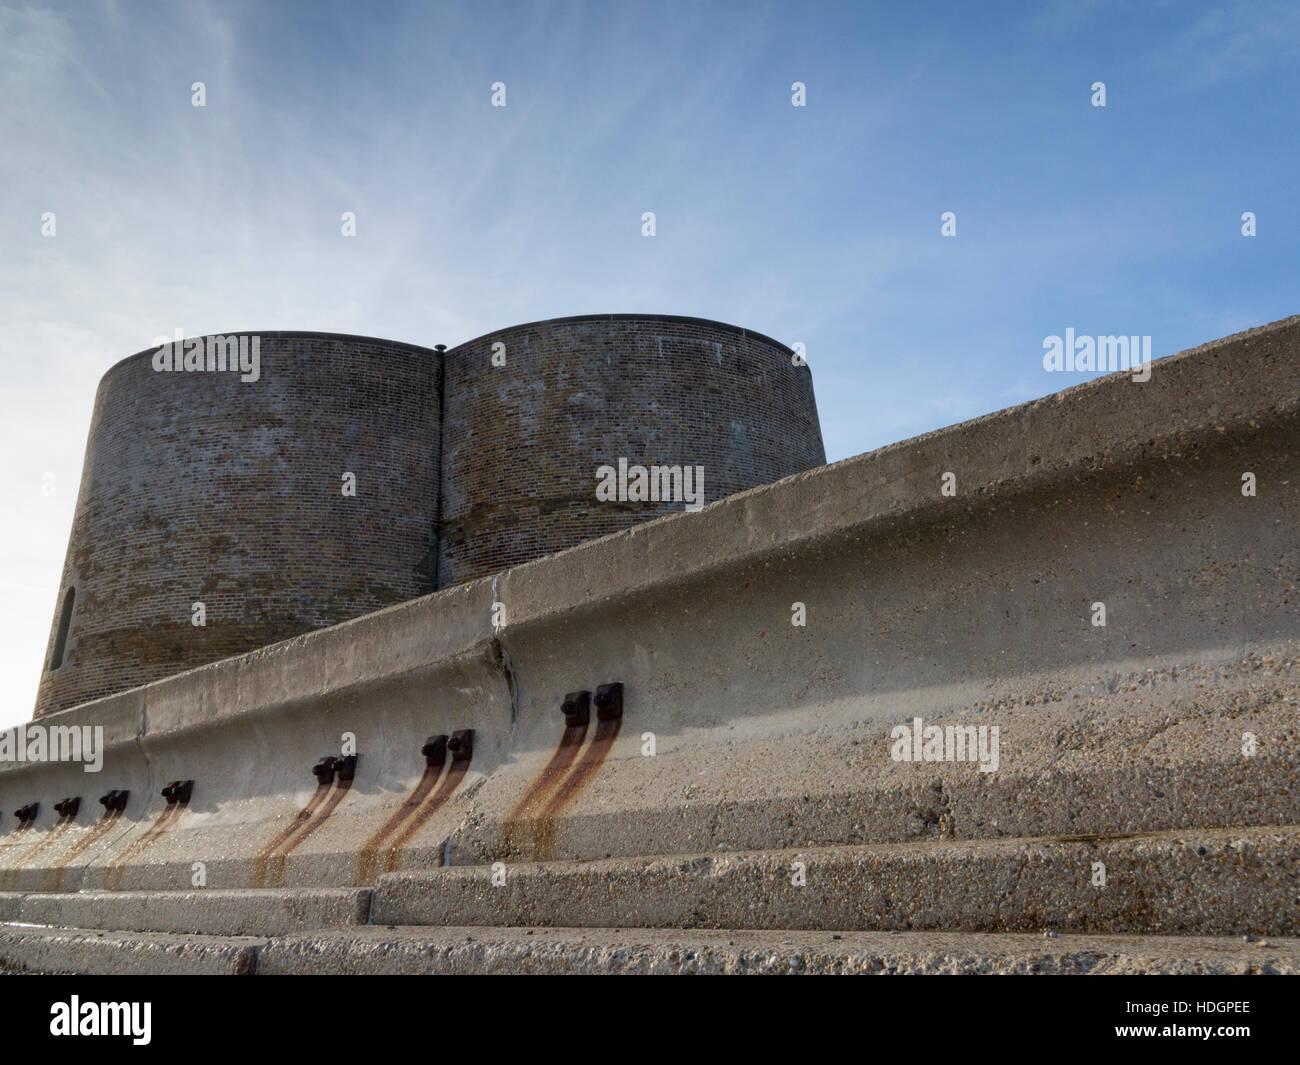 Martello towers behind concrete sea wall defense, Aldeburgh, Suffolk,England - Stock Image